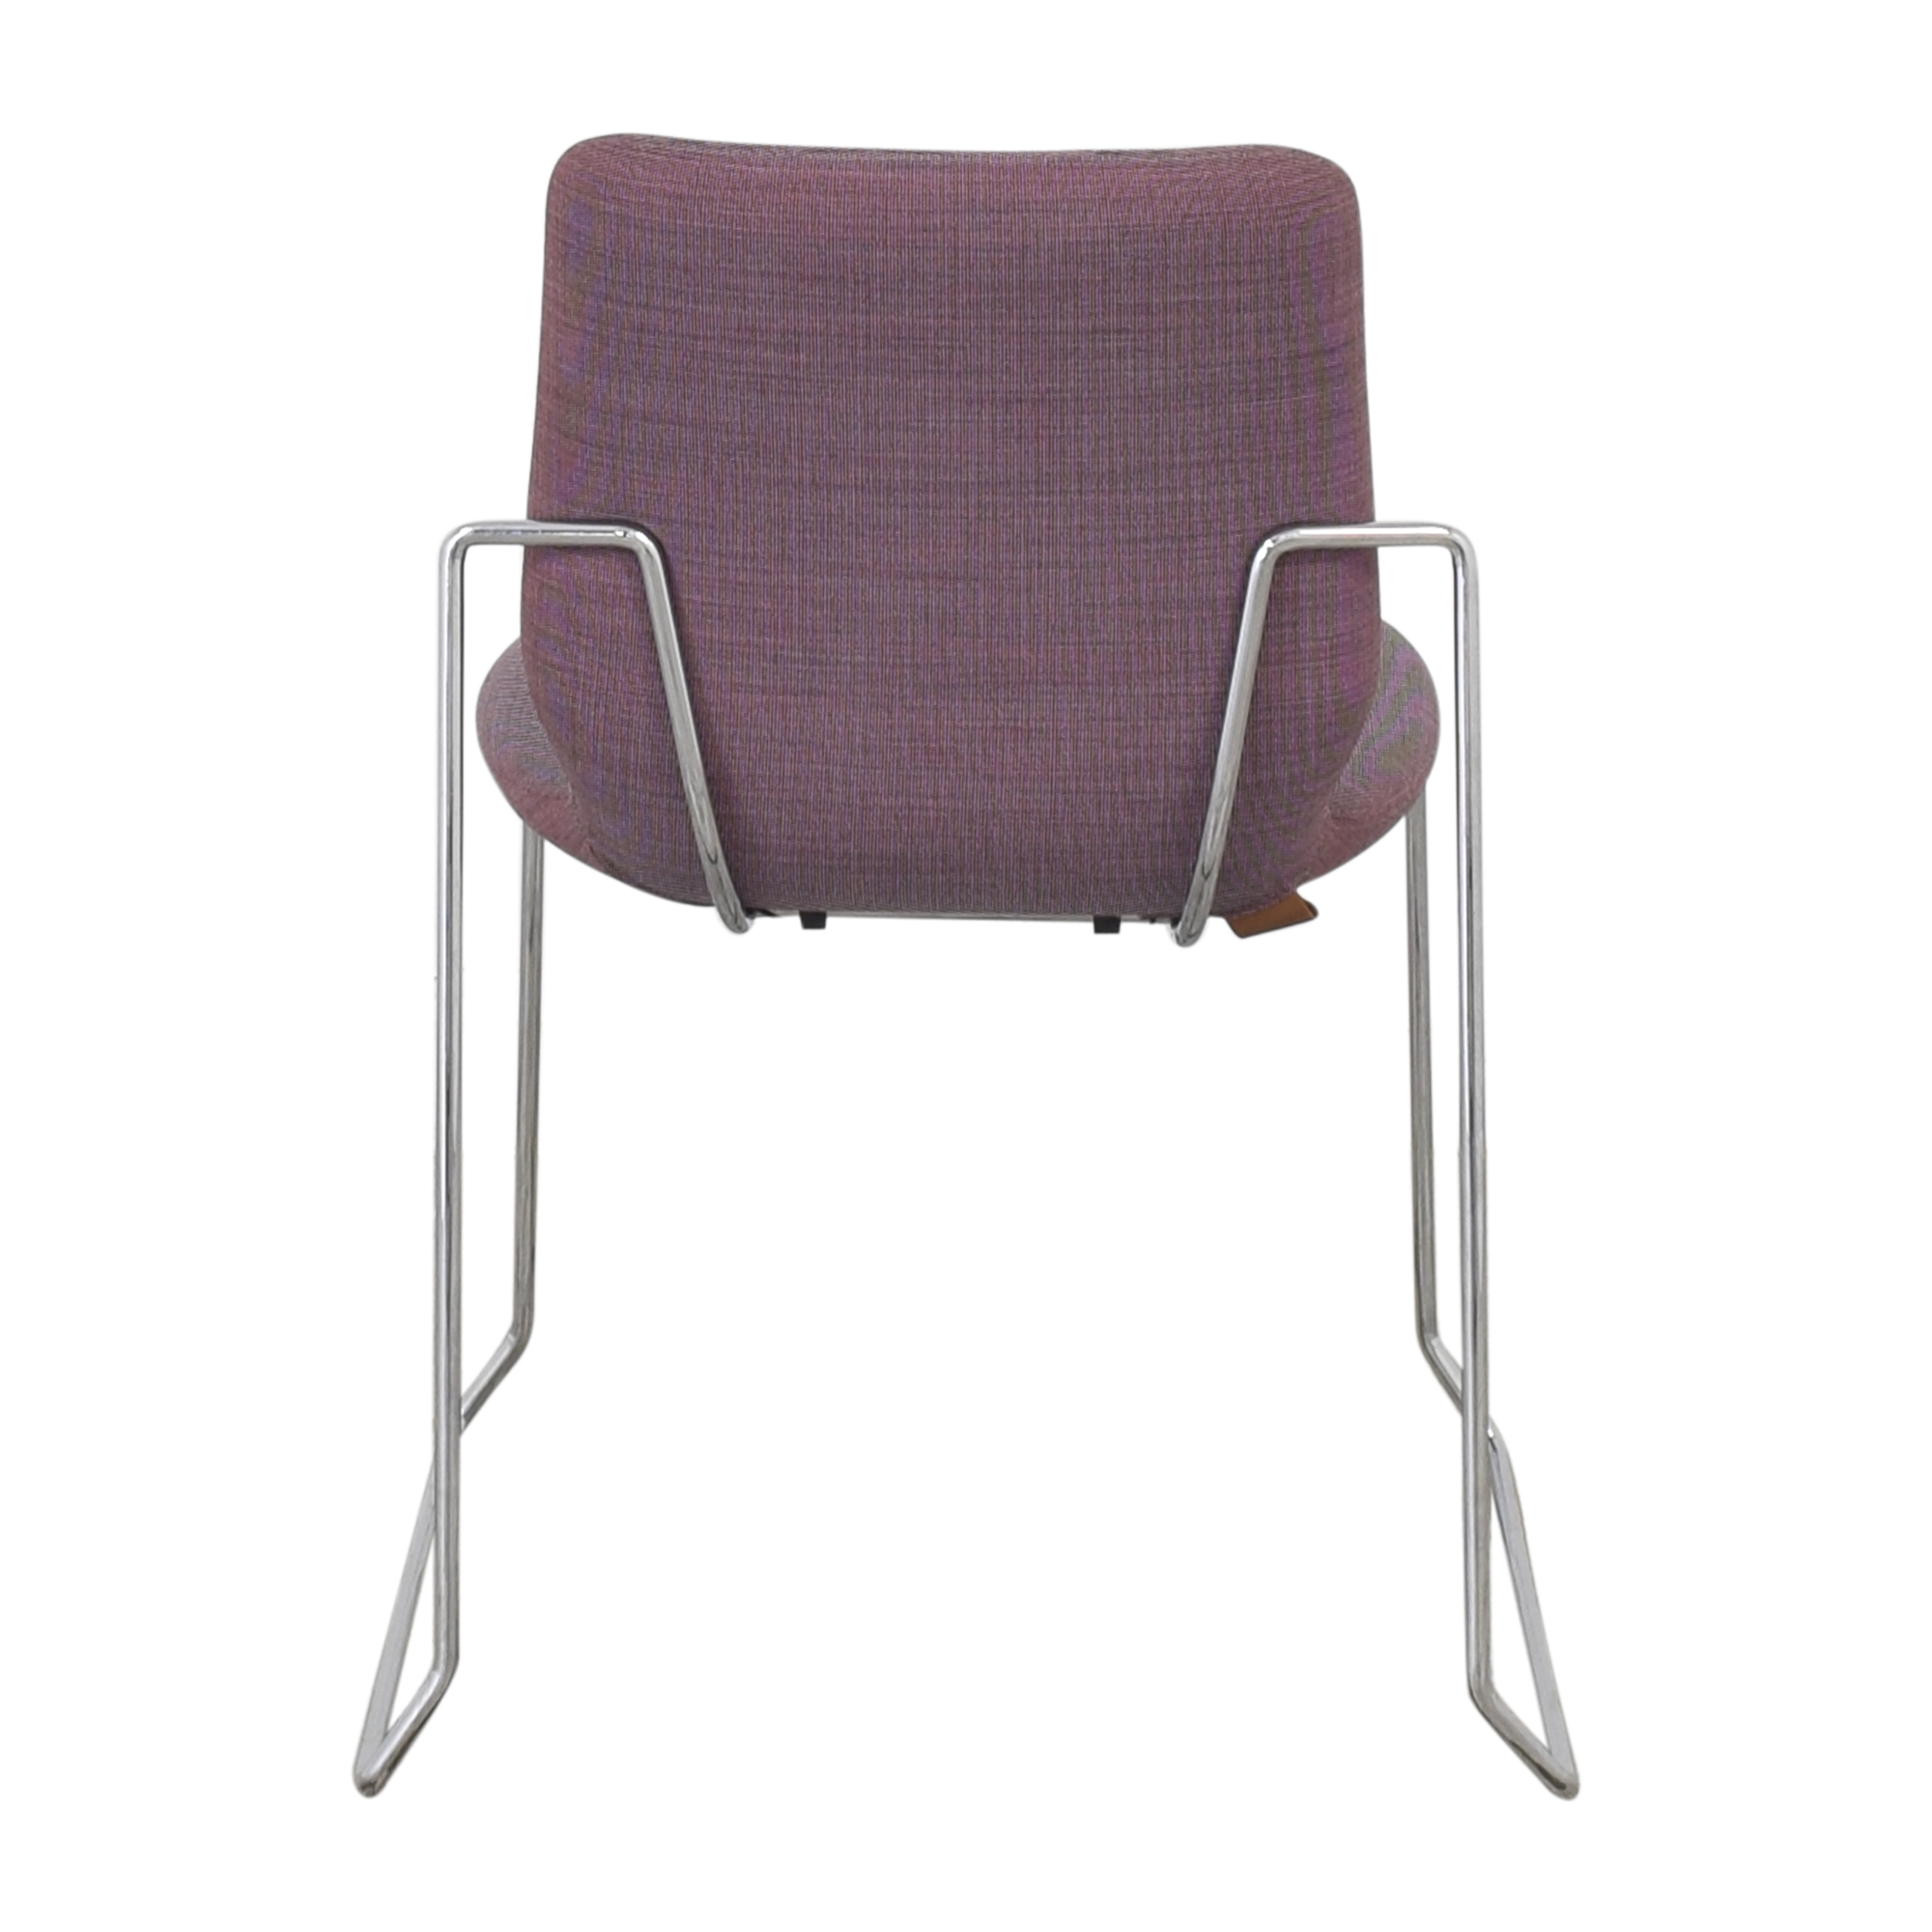 shop Koleksiyon Asanda Armless Chair Koleksiyon Accent Chairs